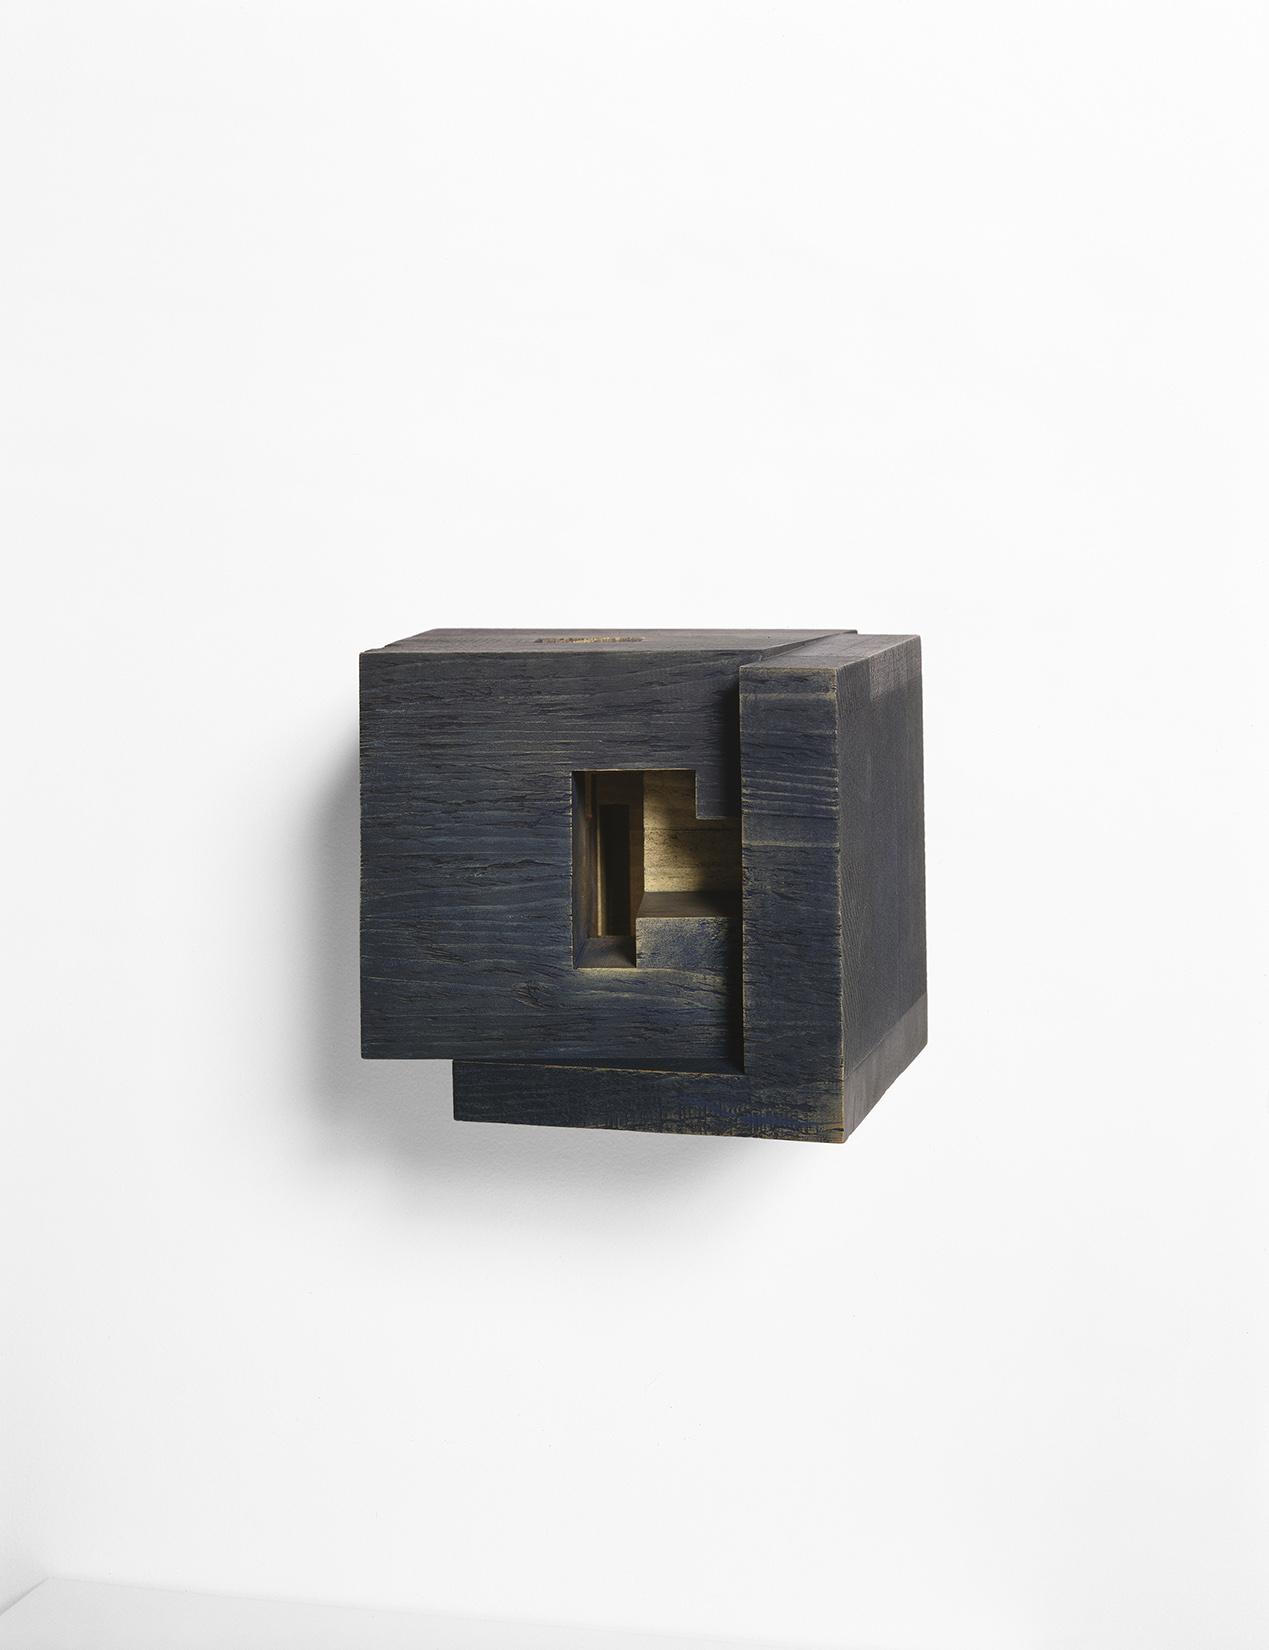 Demeure III  (2001)   Bois polychrome, 19 x 25 x 24 cm, collection de l'artiste. photo : Richard-Max Tremblay